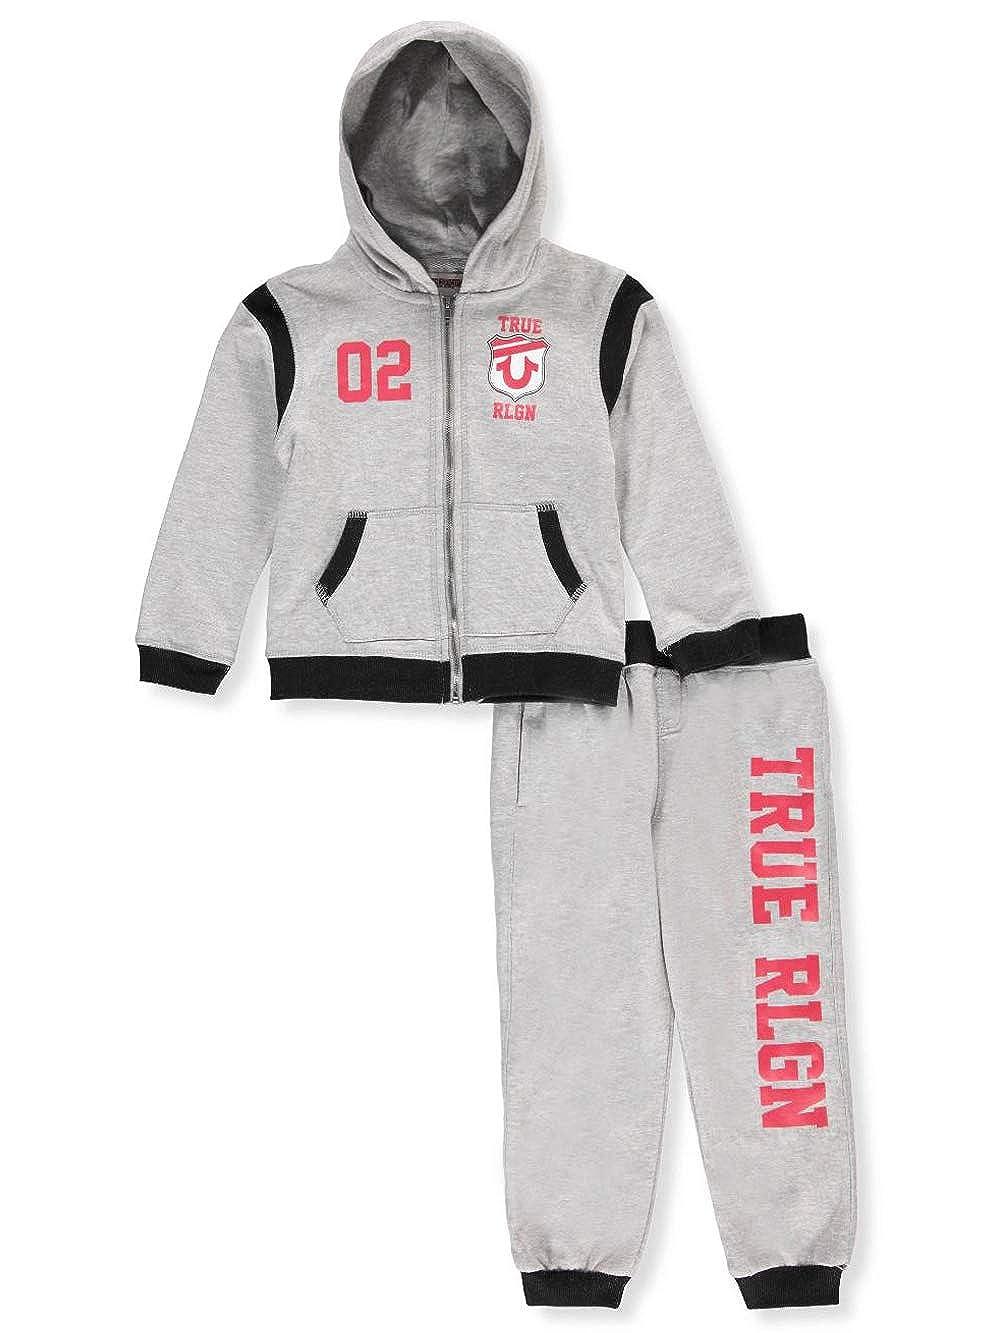 1e024715f True Religion 2-piece sweatsuit pants set. Fleece hoodie with zip closure,  jersey hood lining, split kangaroo pocket, contrast rib-knit trim, ...